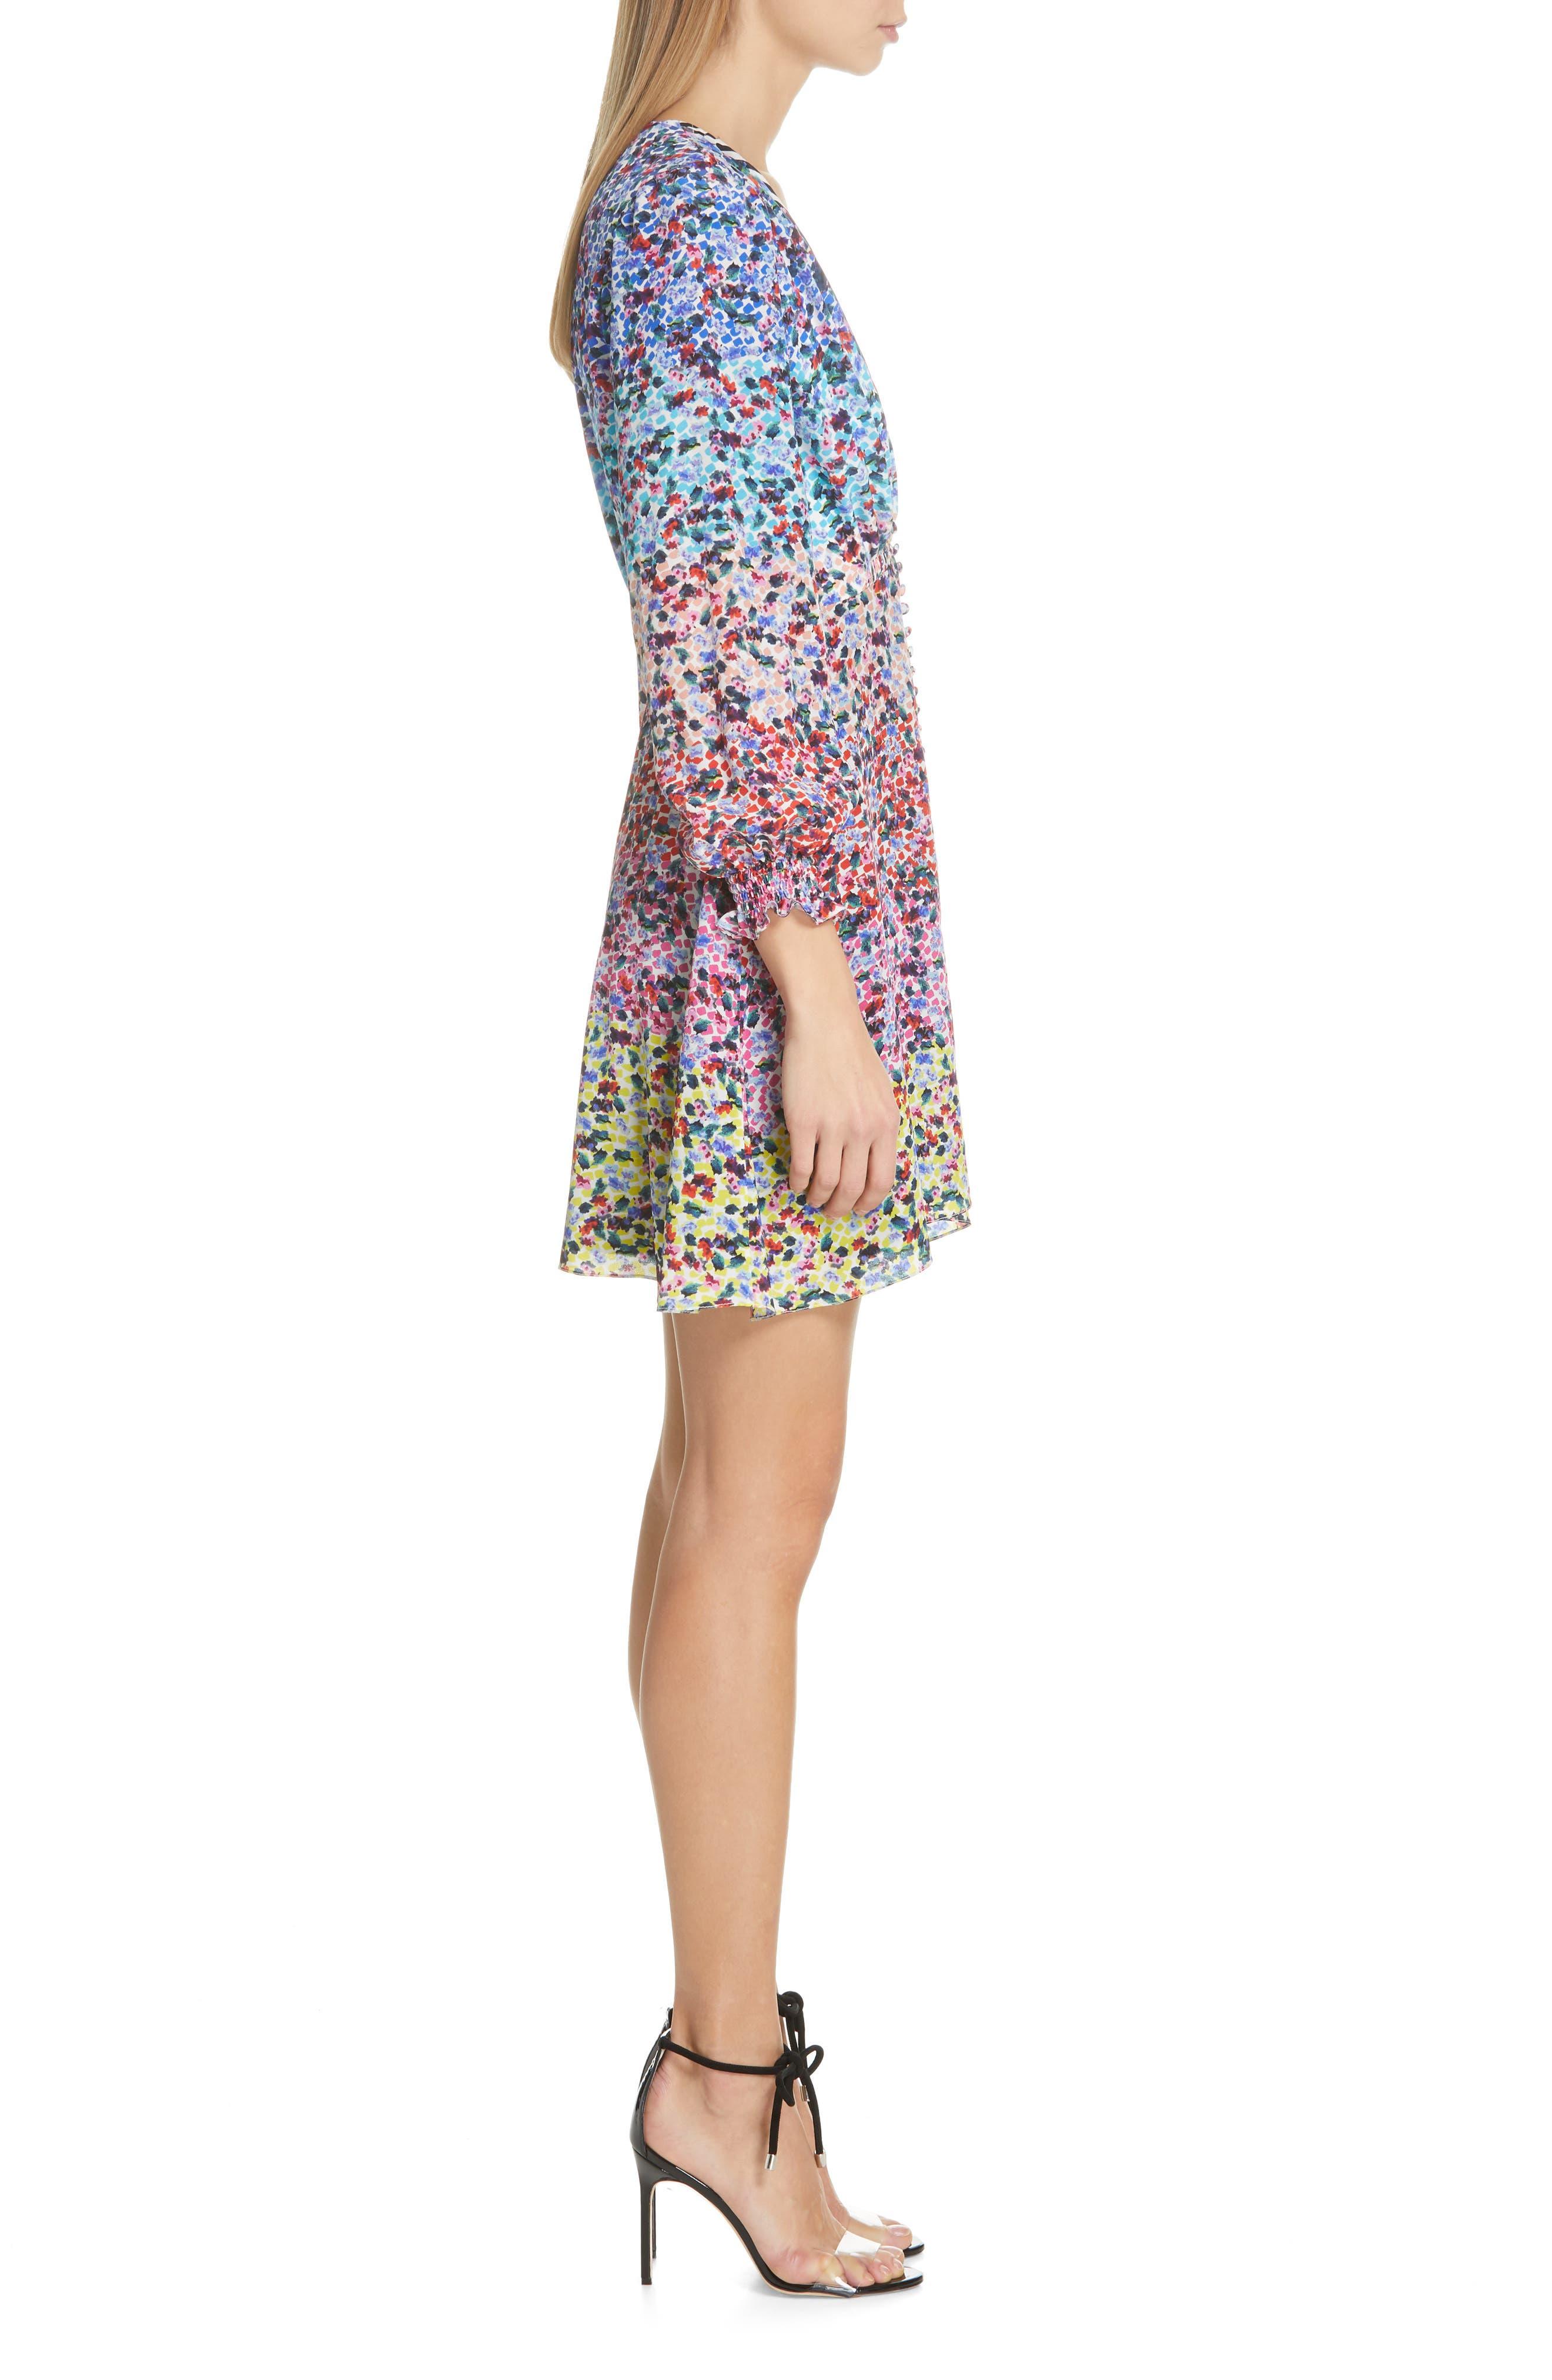 SALONI, Eve Floral Print Dress, Alternate thumbnail 4, color, RAINBOW GARDENIA PLMT